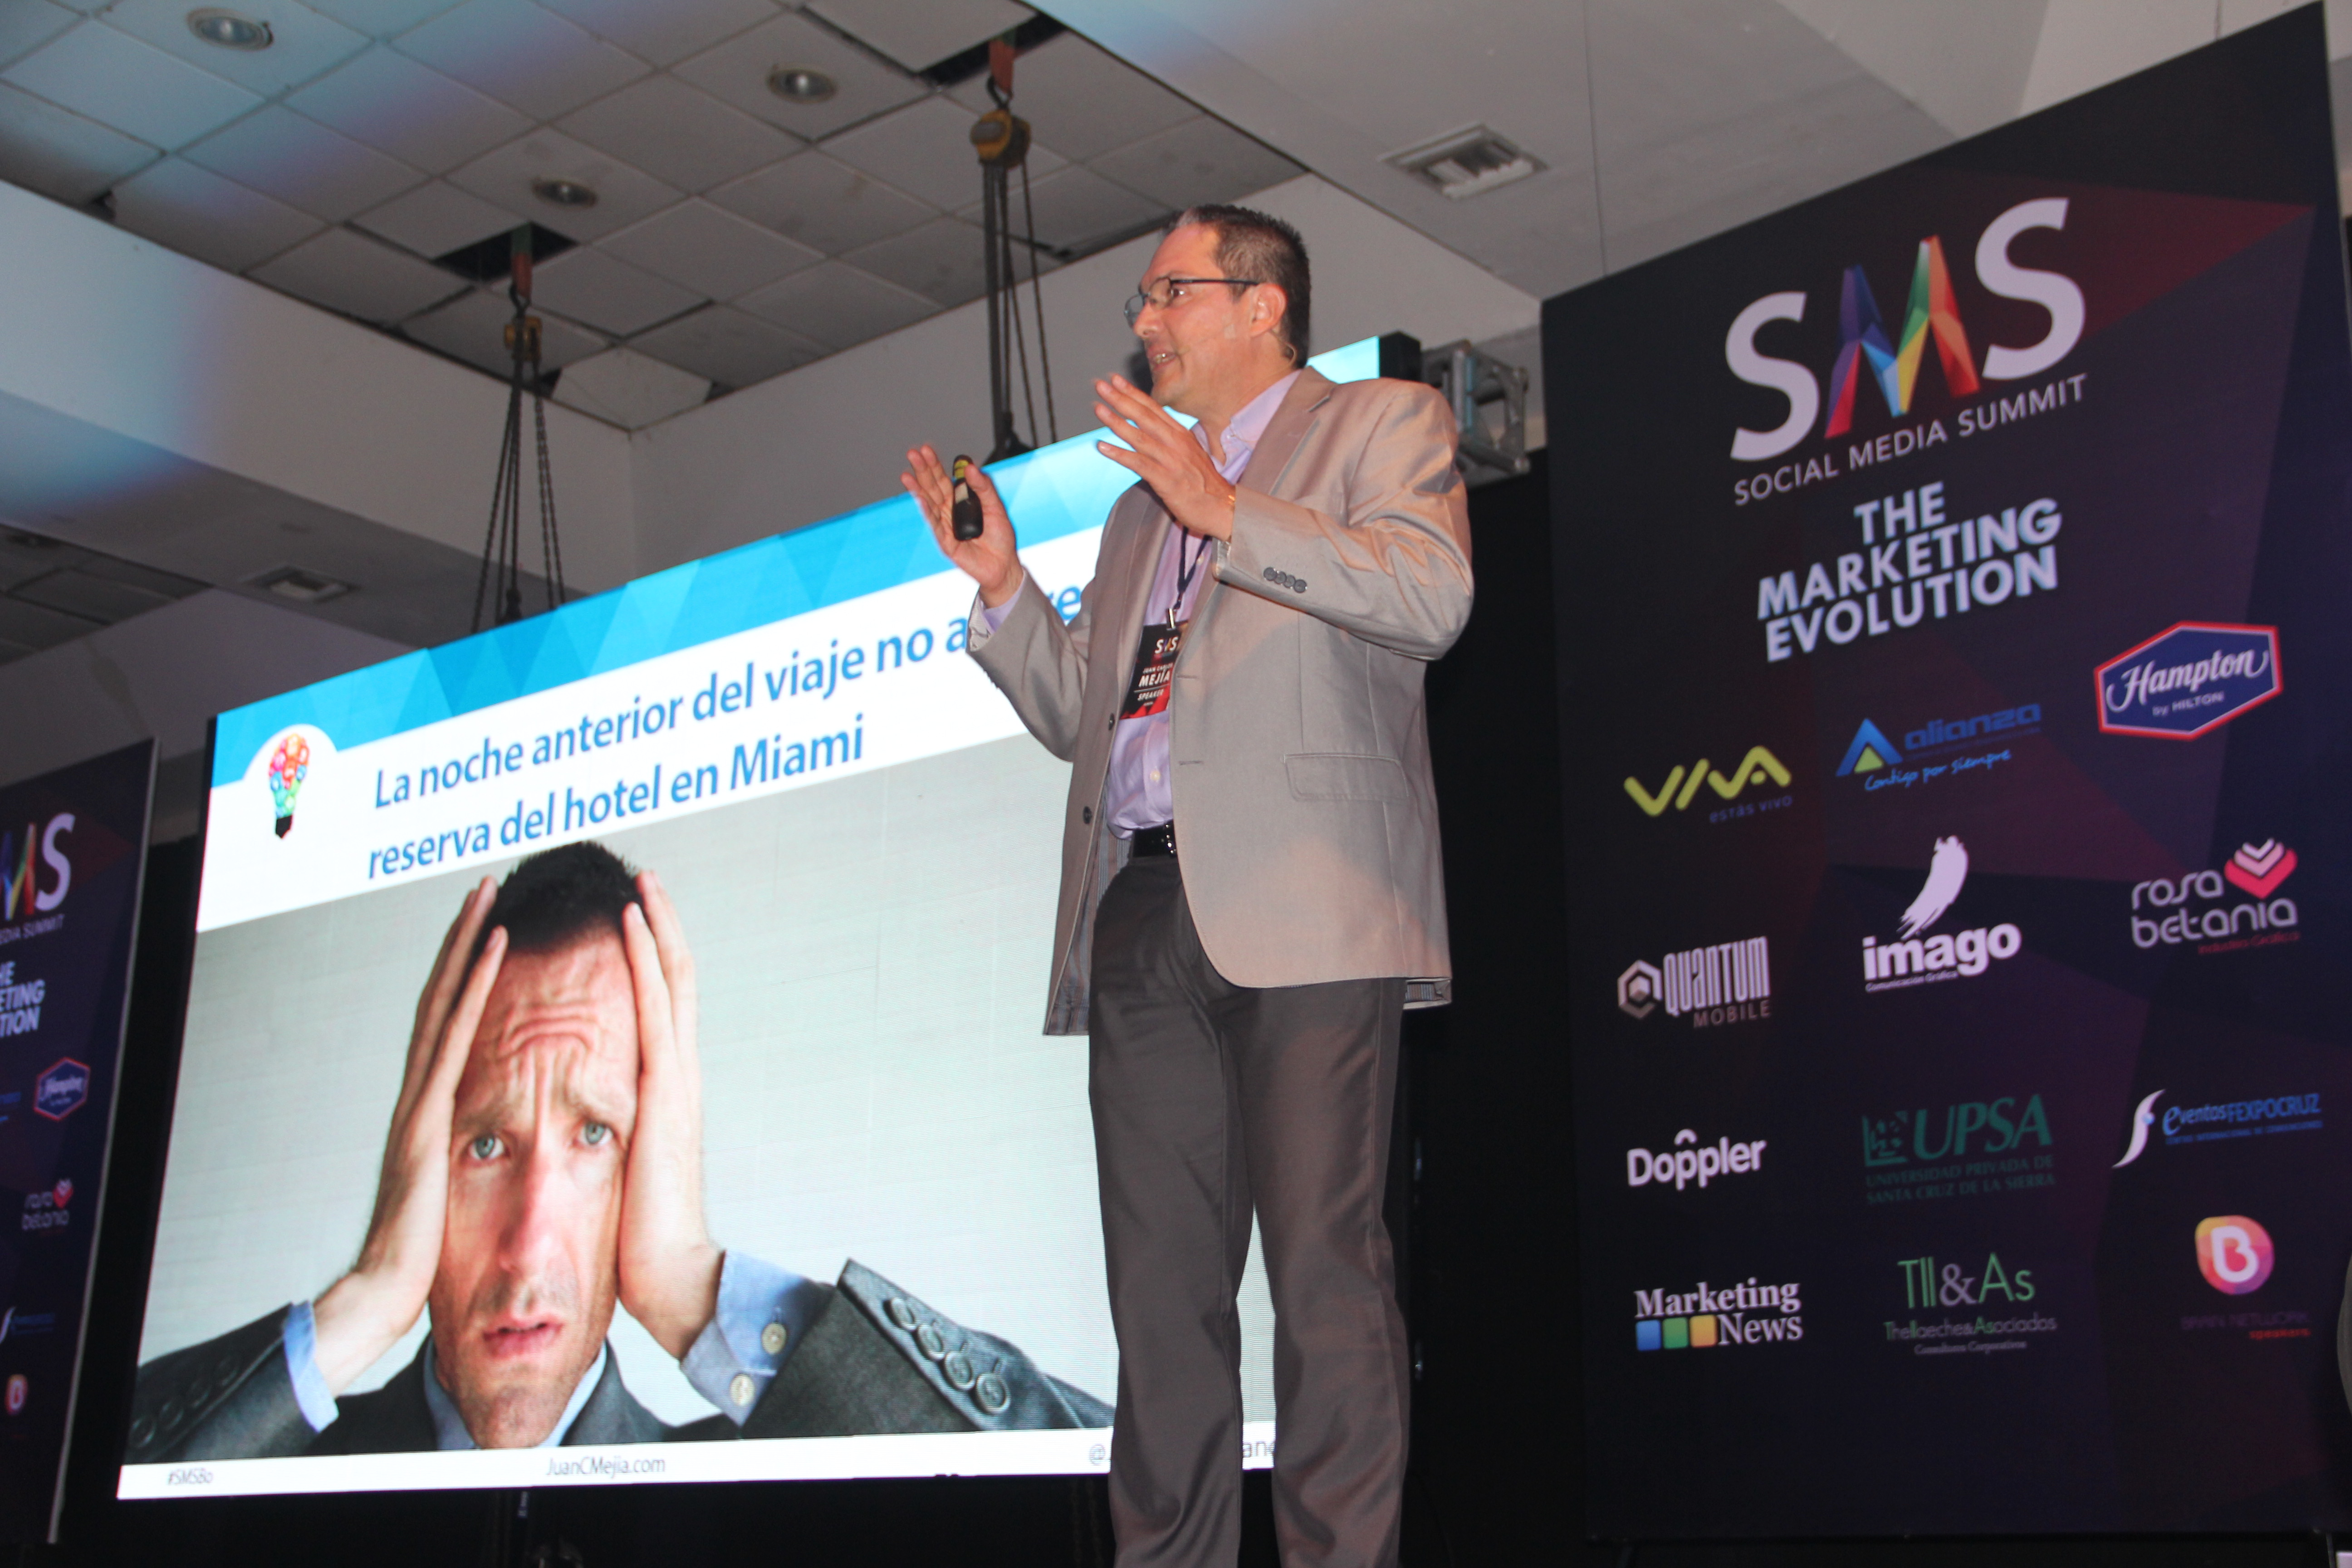 Juan Carlos Mejía Llano - Social Media Summit Santa Cruz